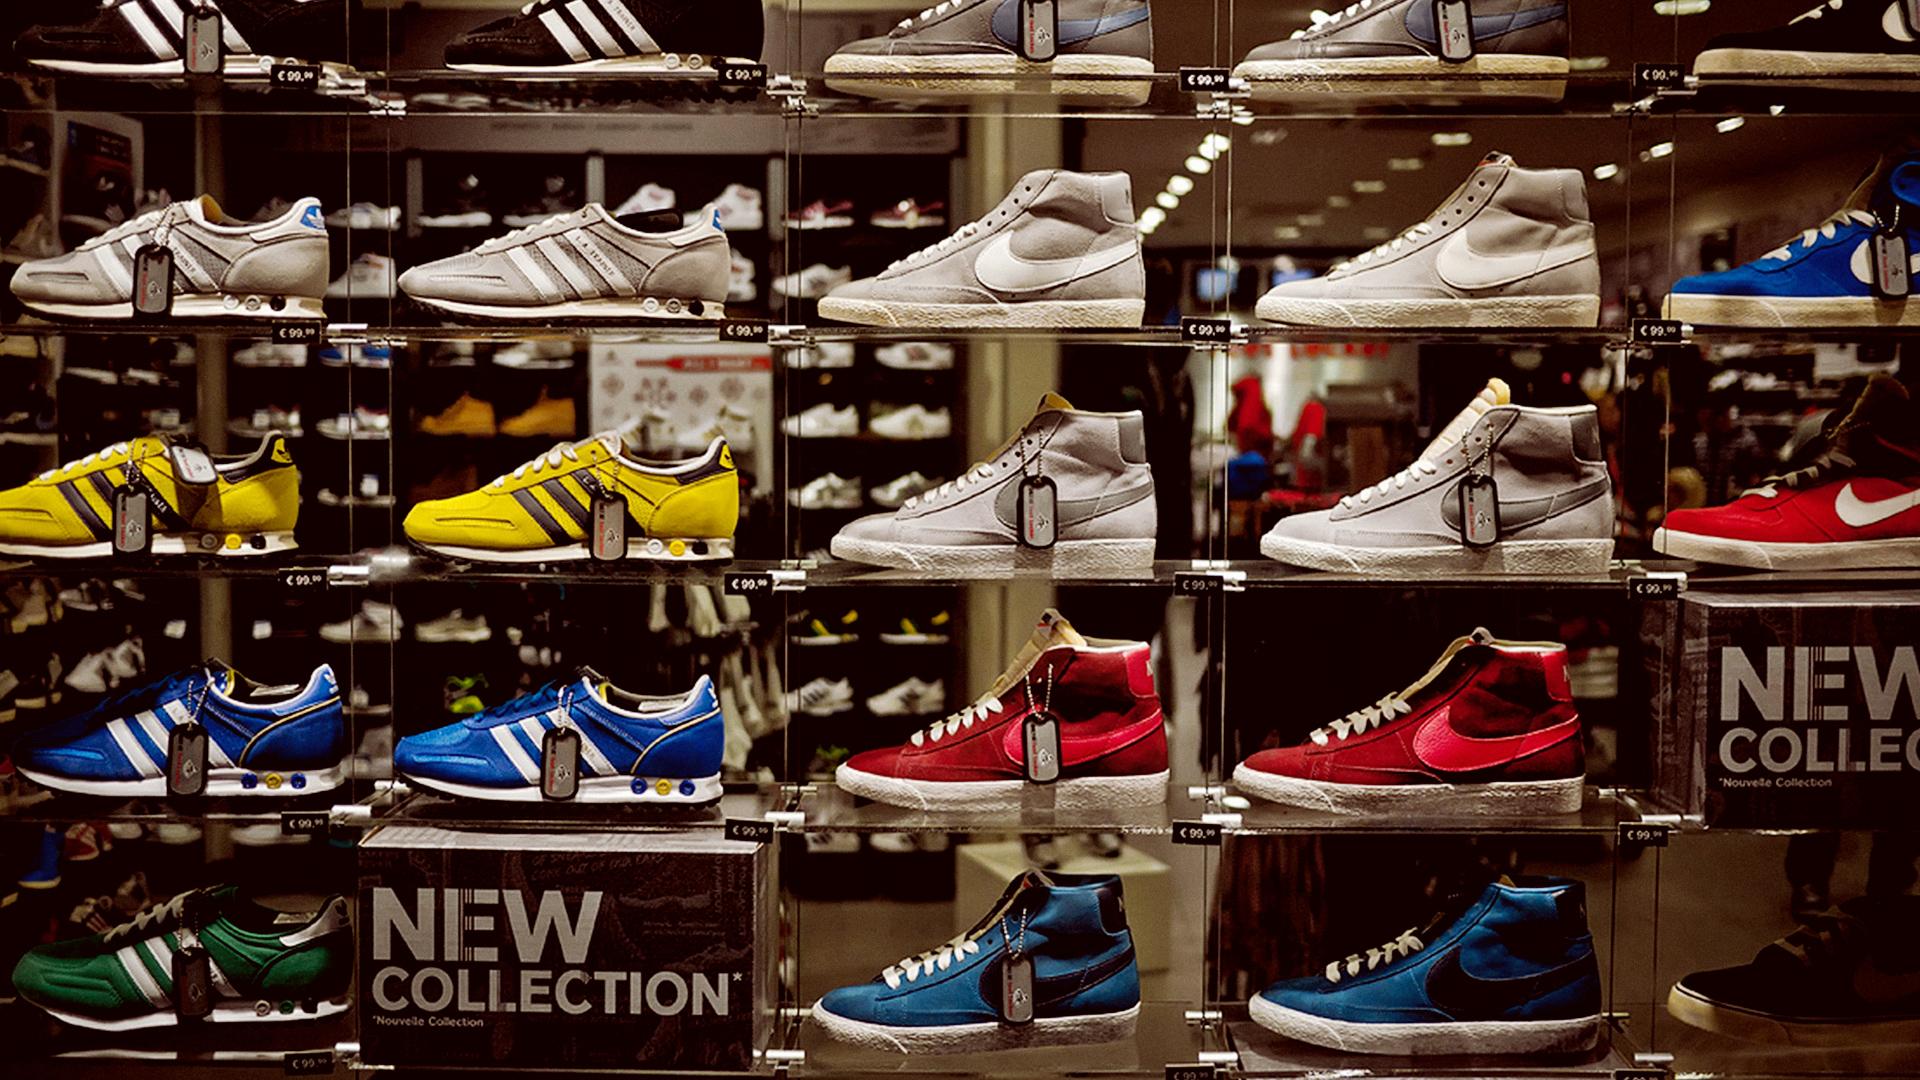 foot locker - photo #34